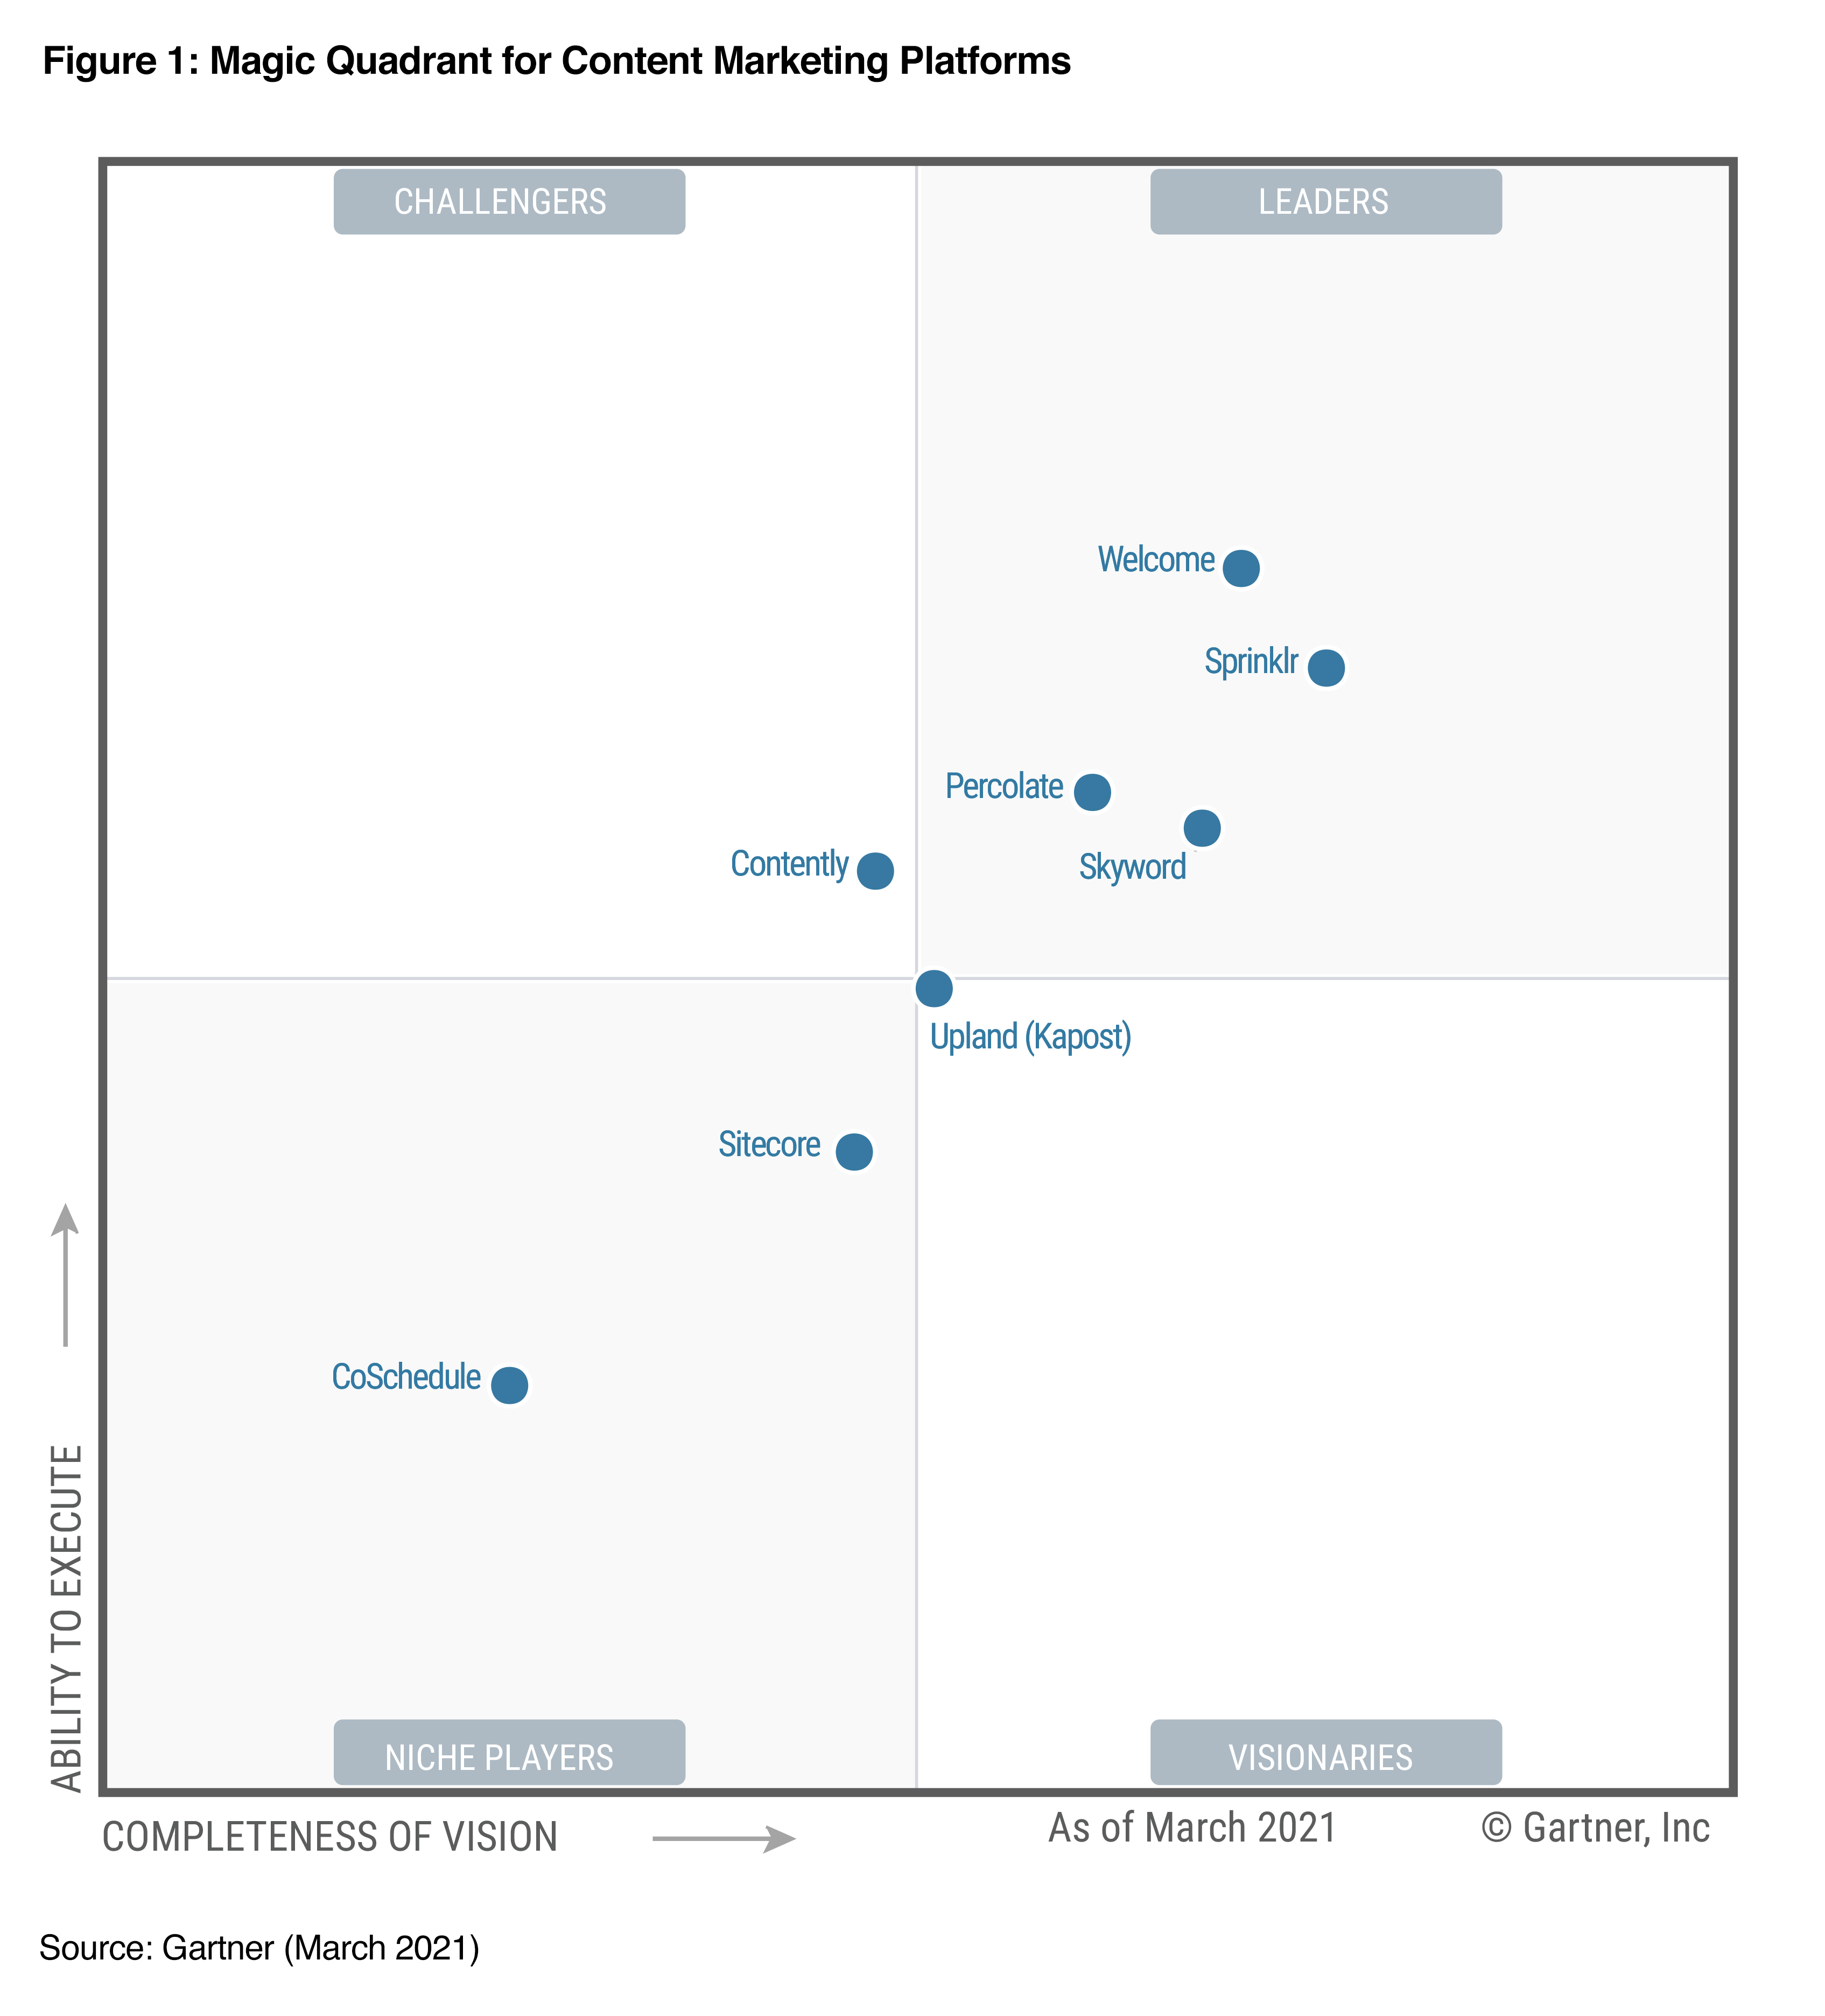 2021 Gartner Magic Quadrant for Content Marketing Platforms